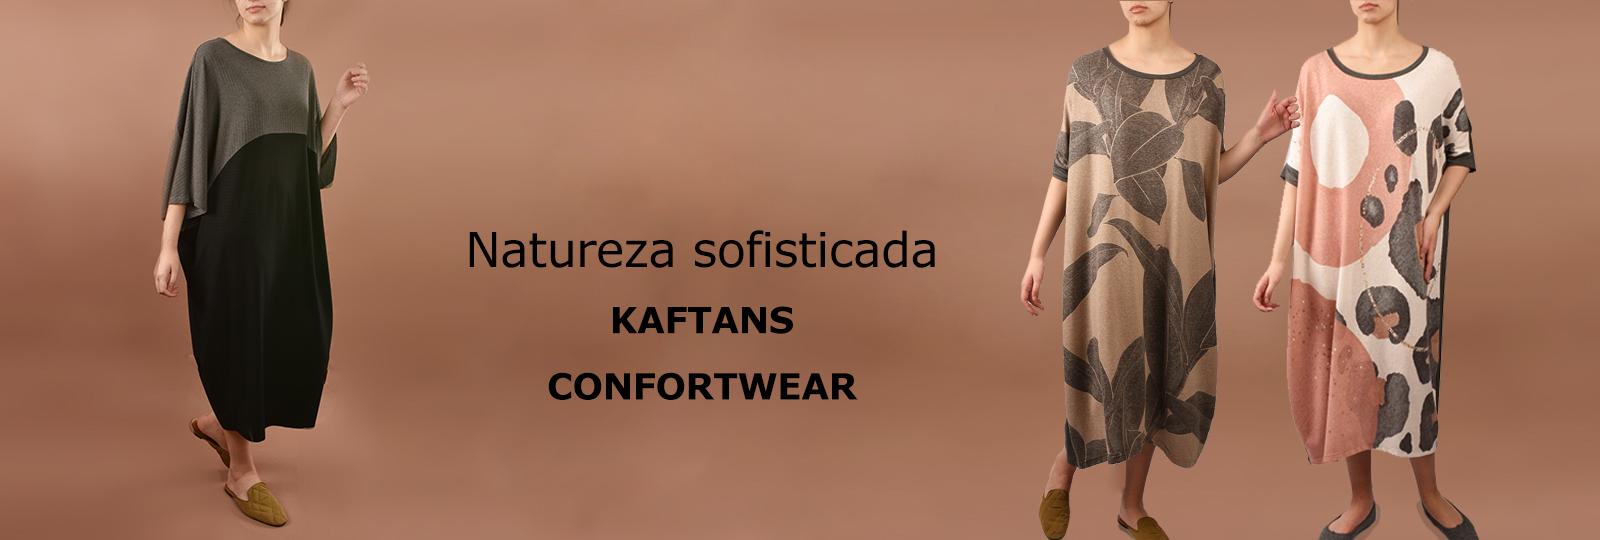 Kaftan Usenatureza, a Natureza que Inspira